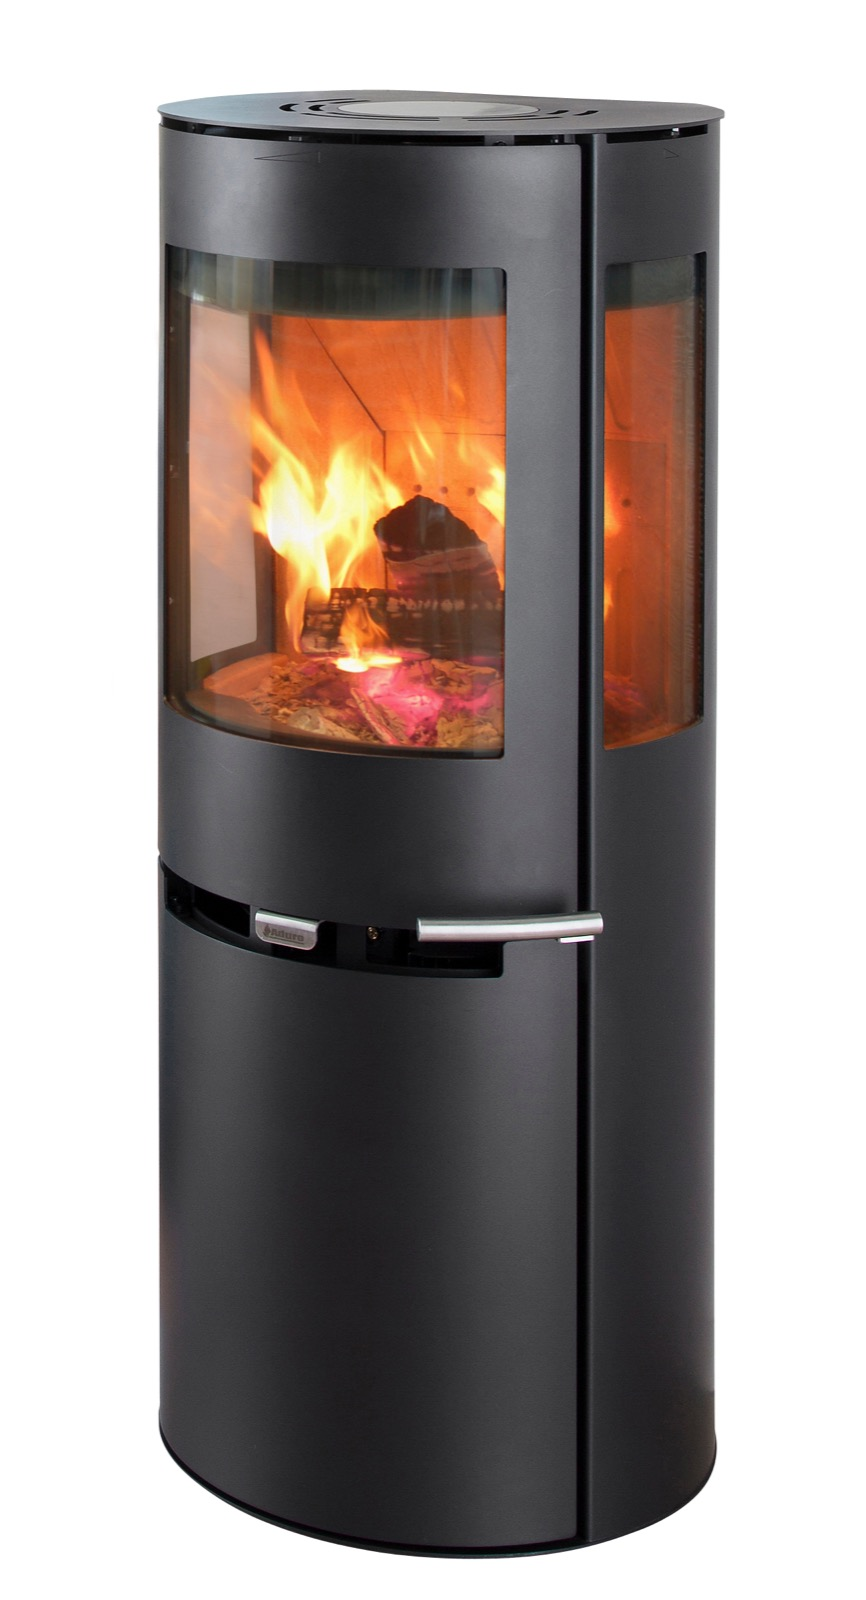 ADURO 9-5 Defra approved Wood Burning Stove